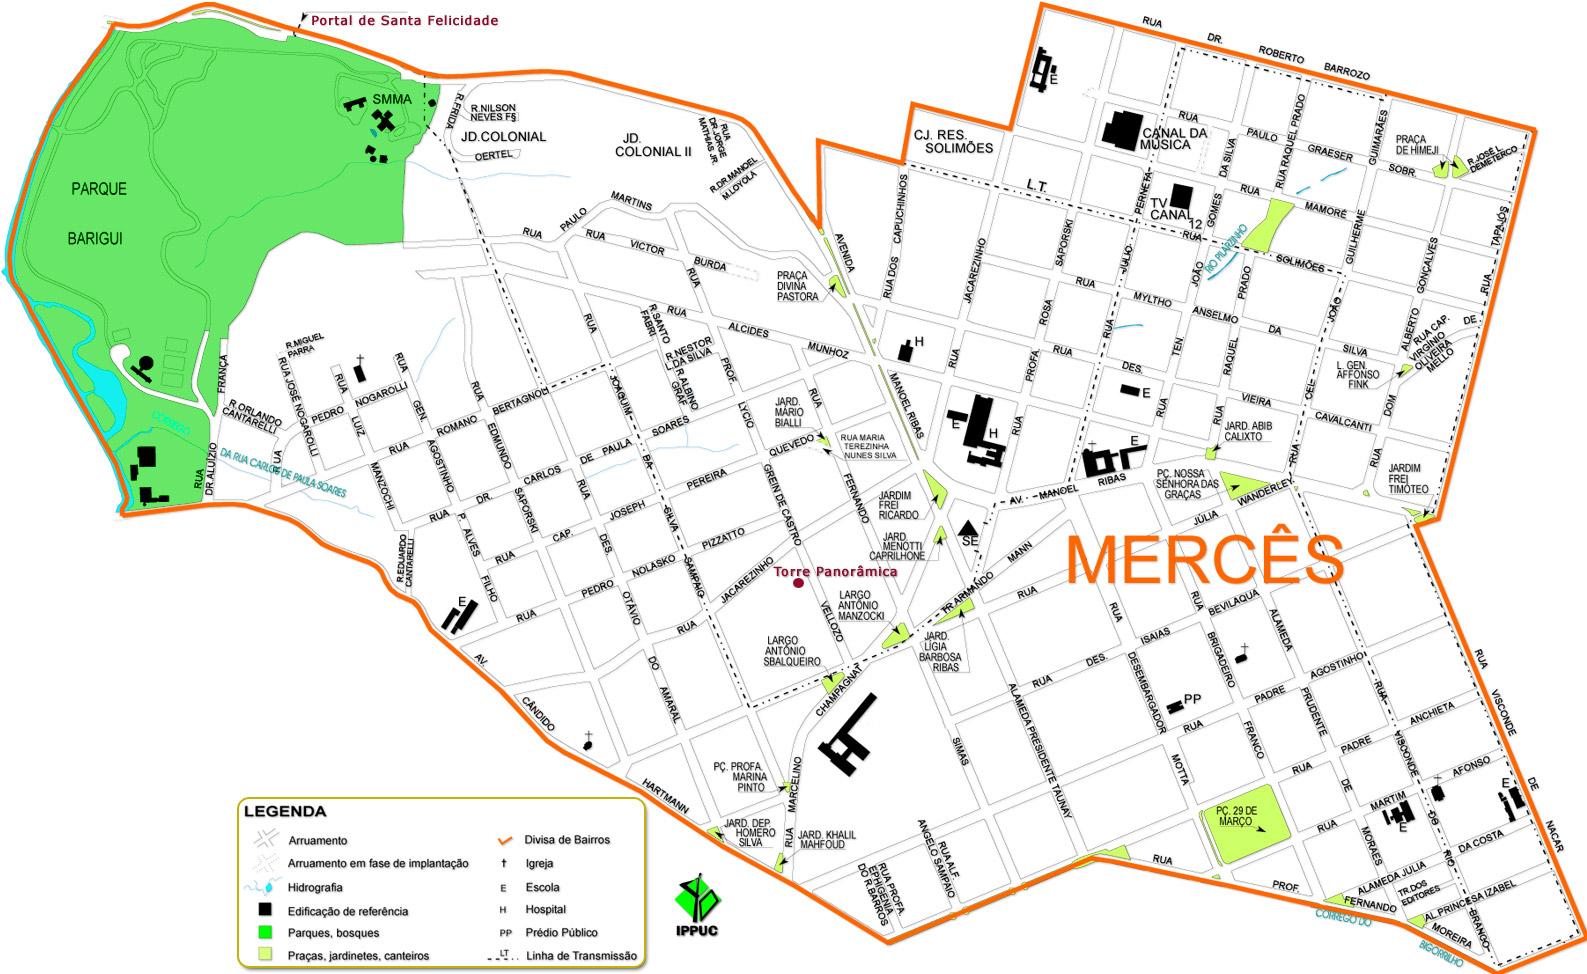 Guia Geográfico Curitiba - Mapa do Bairro Mercês, Canal da Música ...